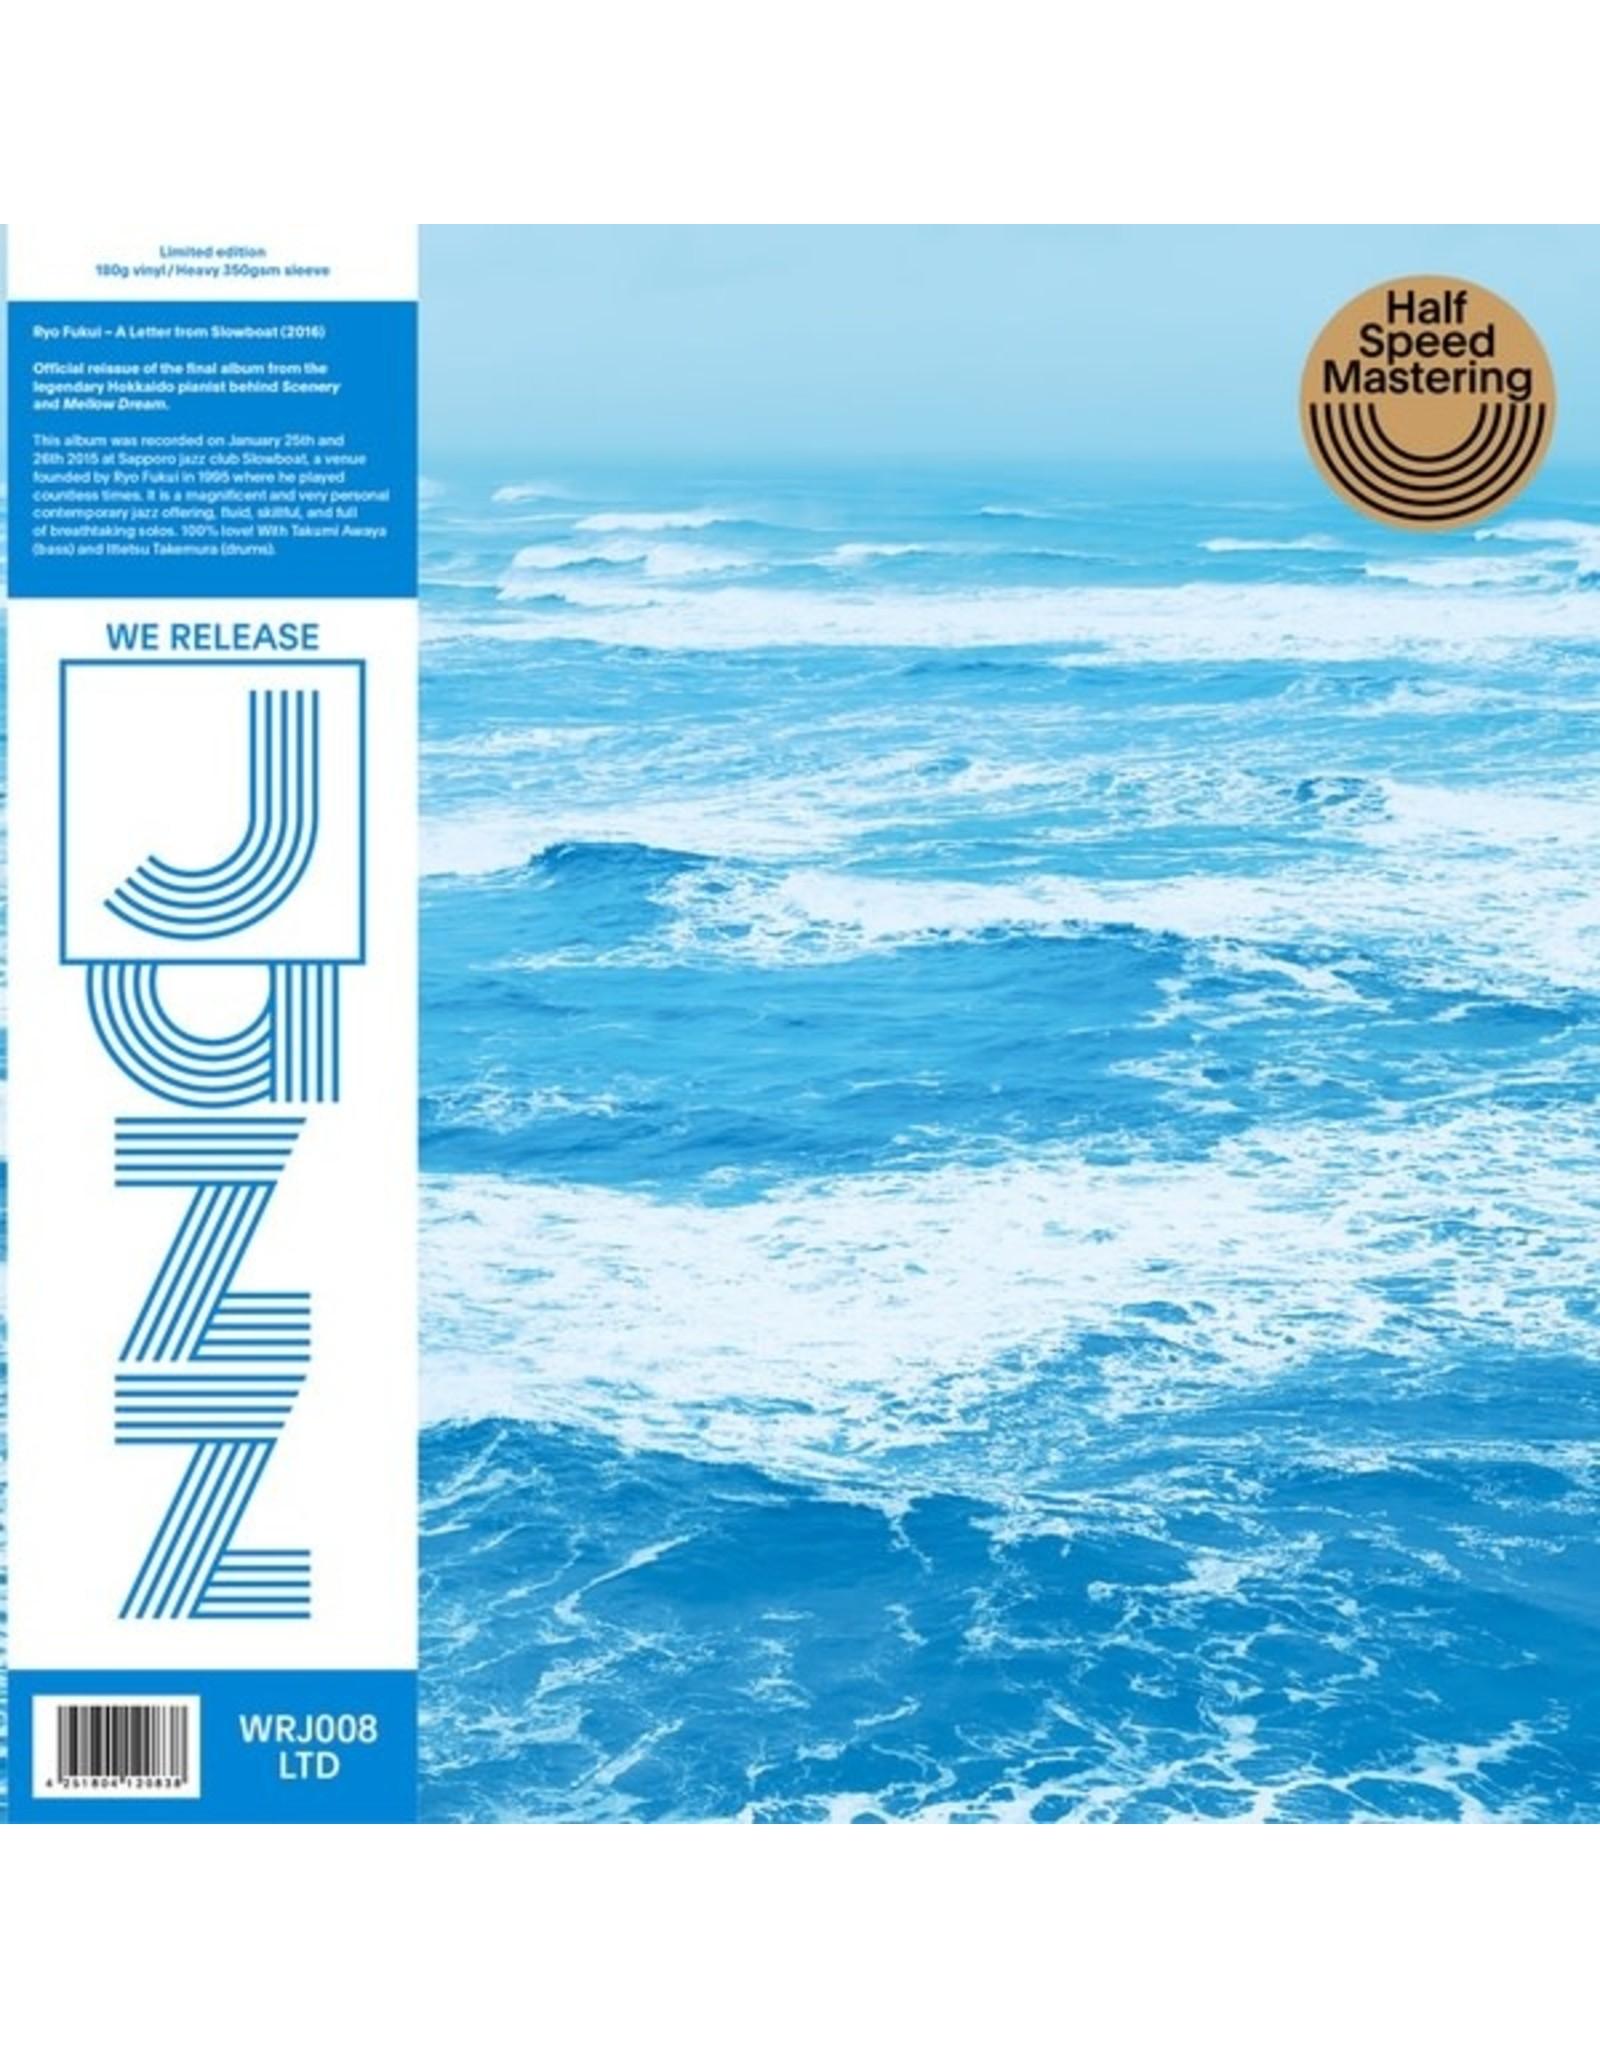 New Vinyl Ryo Fukui - A Letter From Slowboat LP